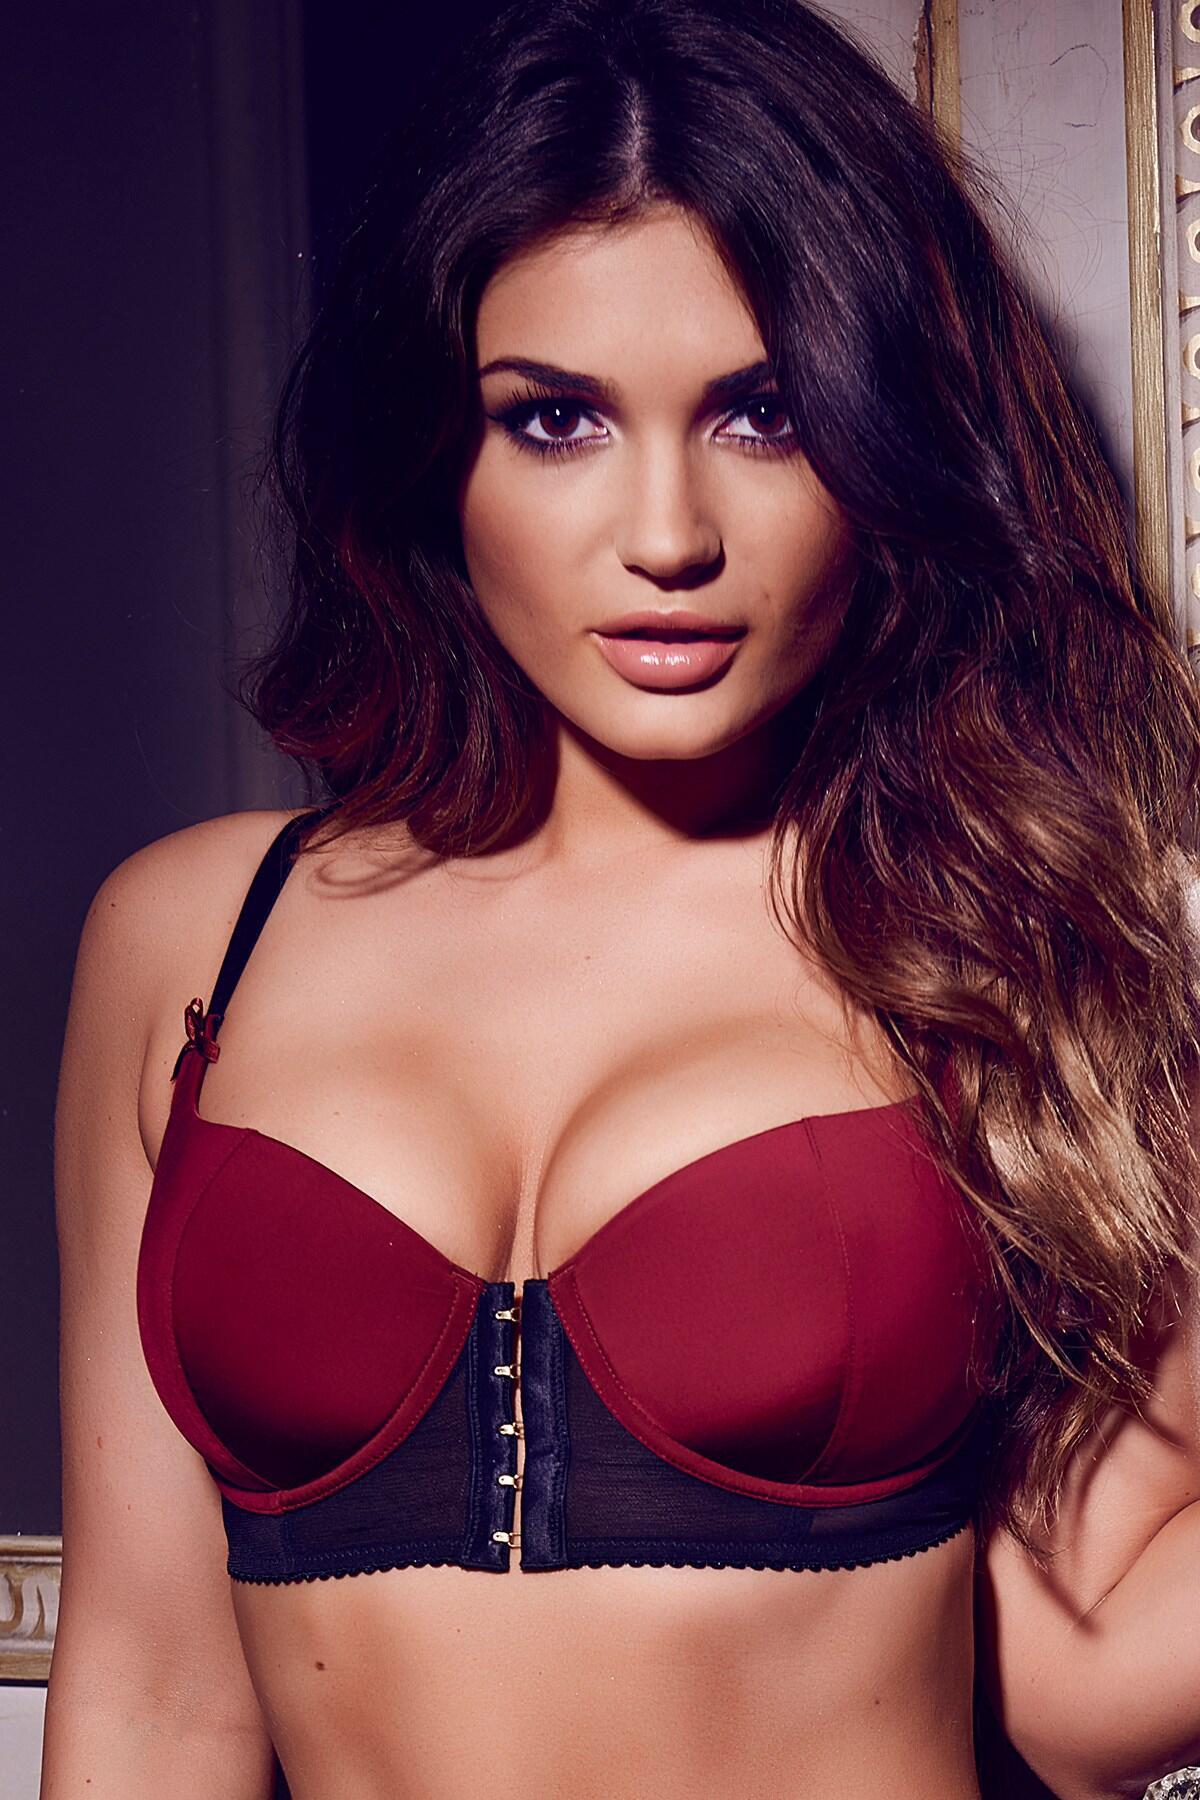 Hook up bra